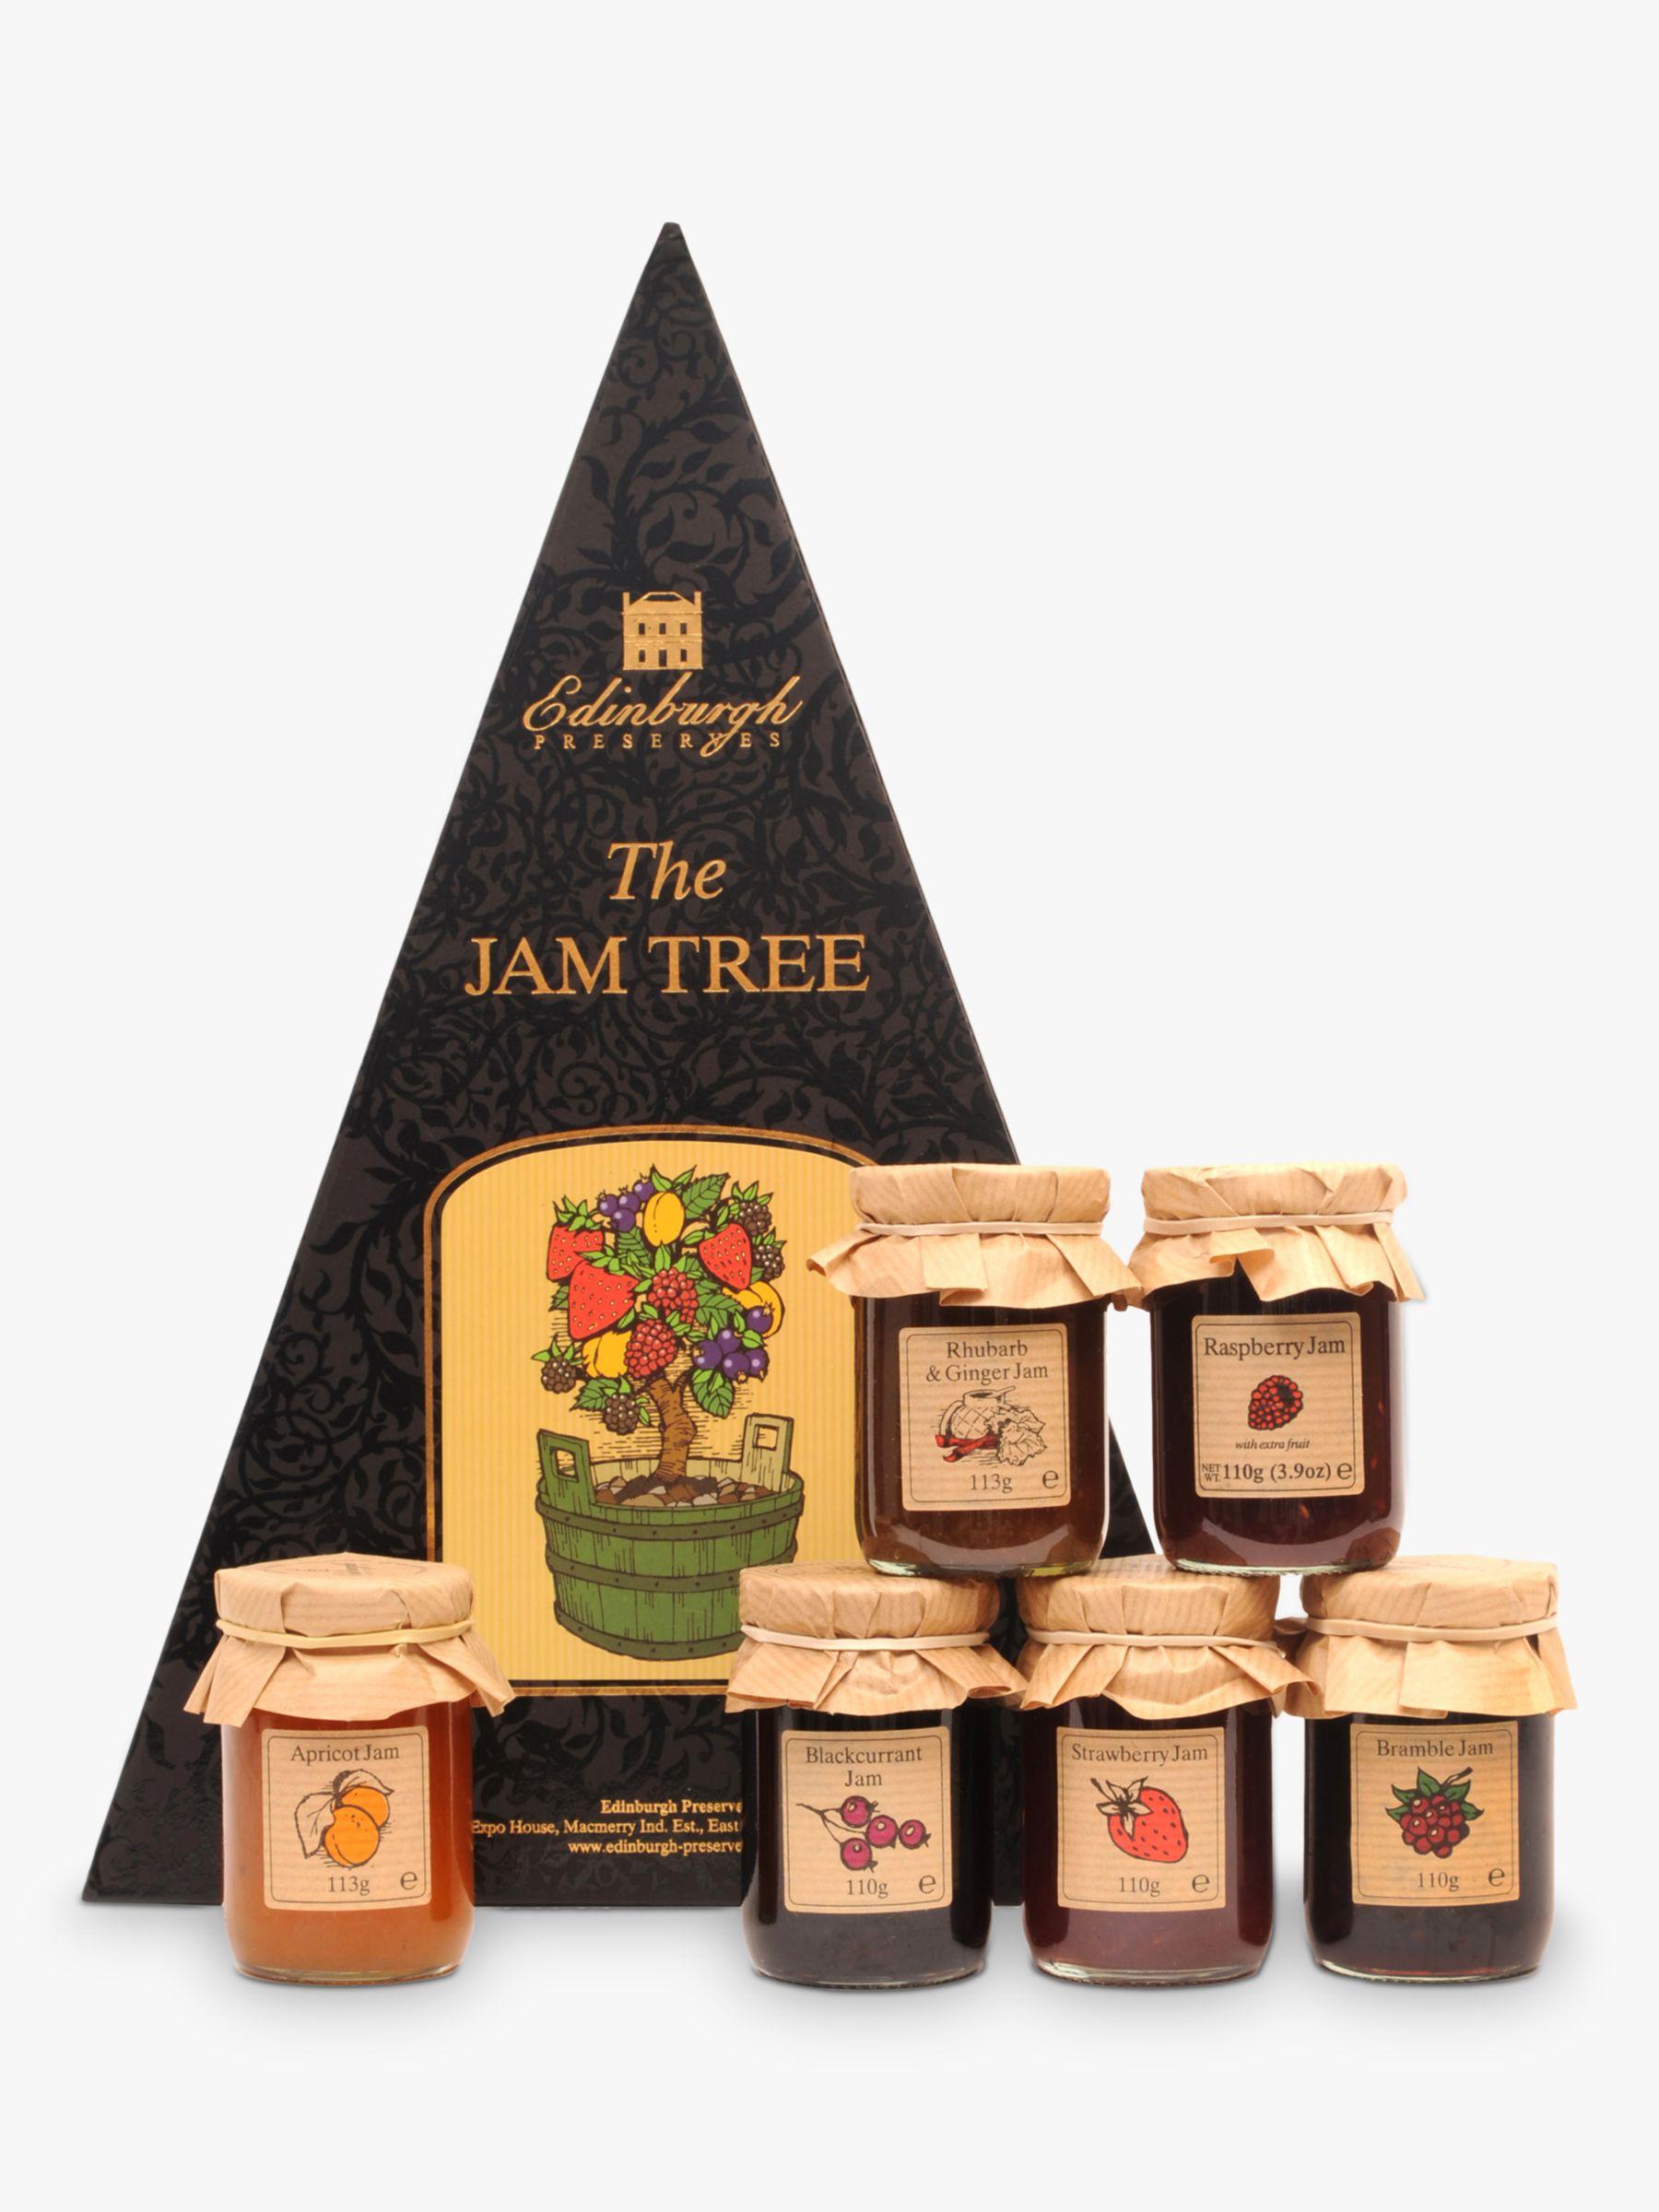 Edinburgh Preserves Edinburgh Preserves The Jam Tree Box, 660g